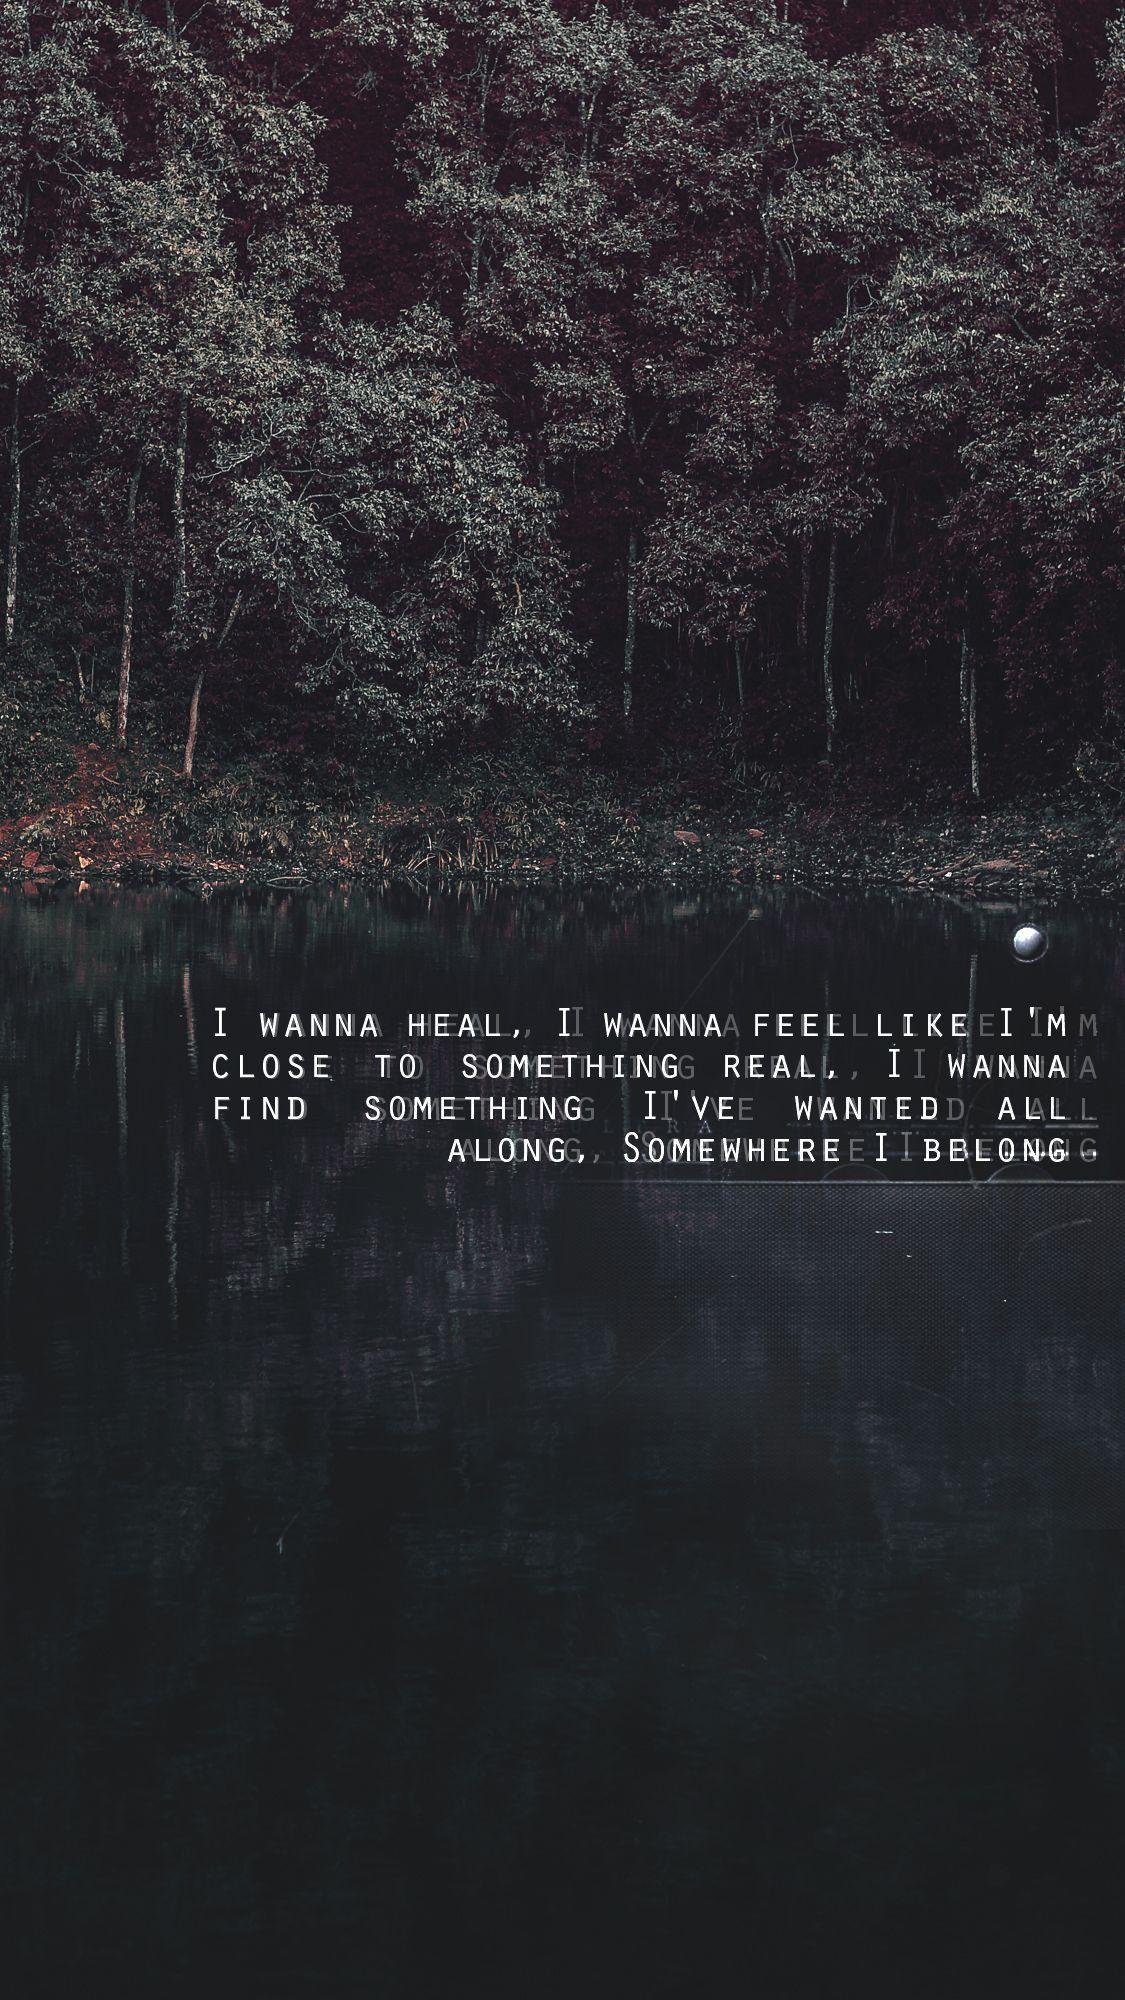 Linkin Park Lyrics Wallpapers Wallpaper Cave